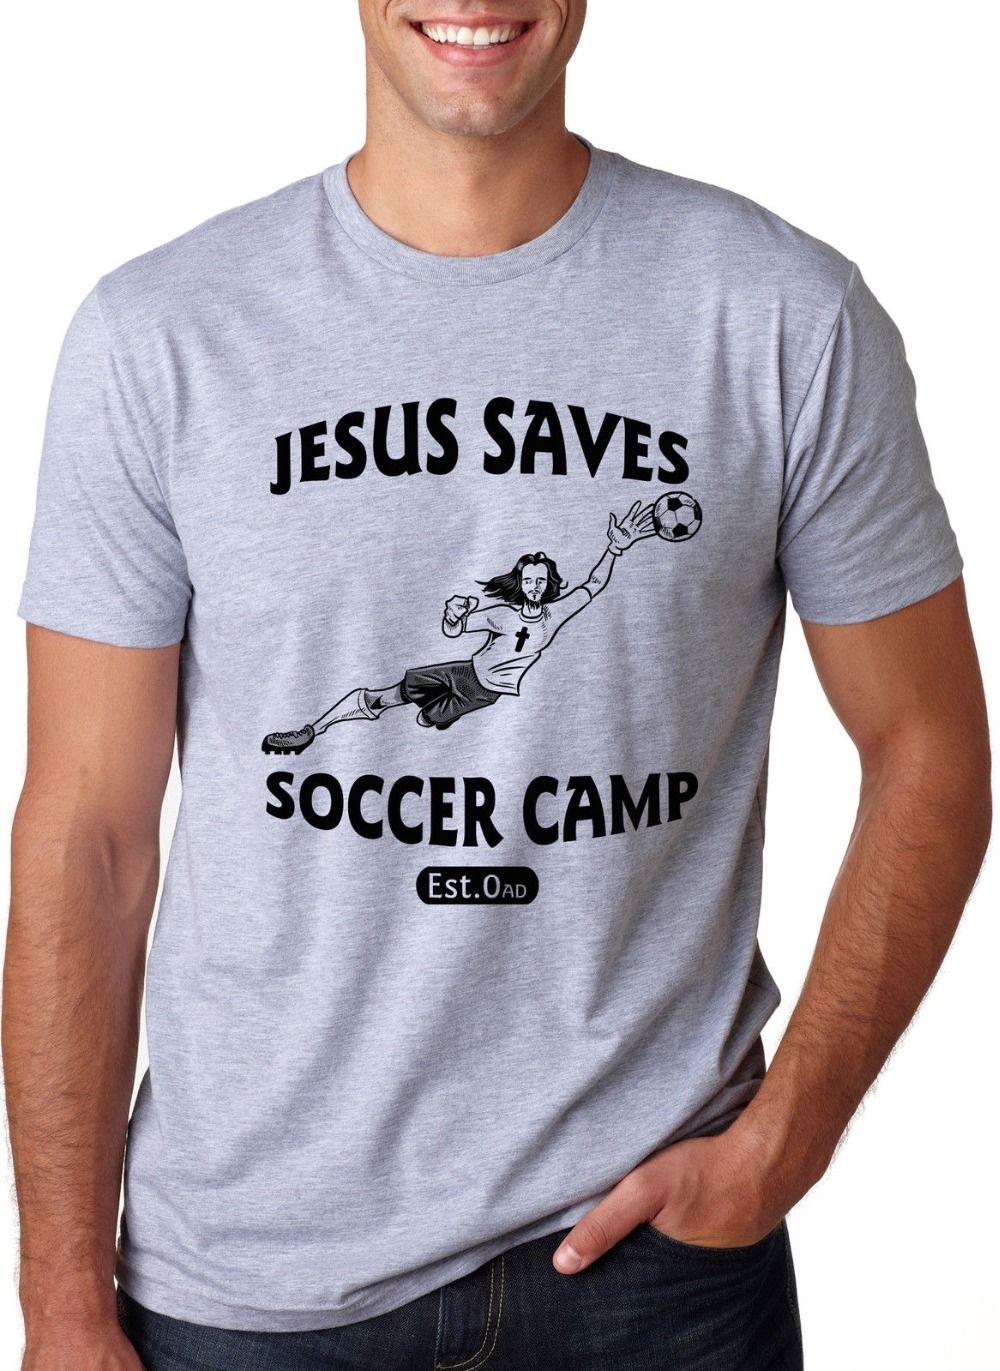 2020 Mode Hot Jesus Saves Soccers T-shirt drôle Goalies Religion Sporter T Tee shirt